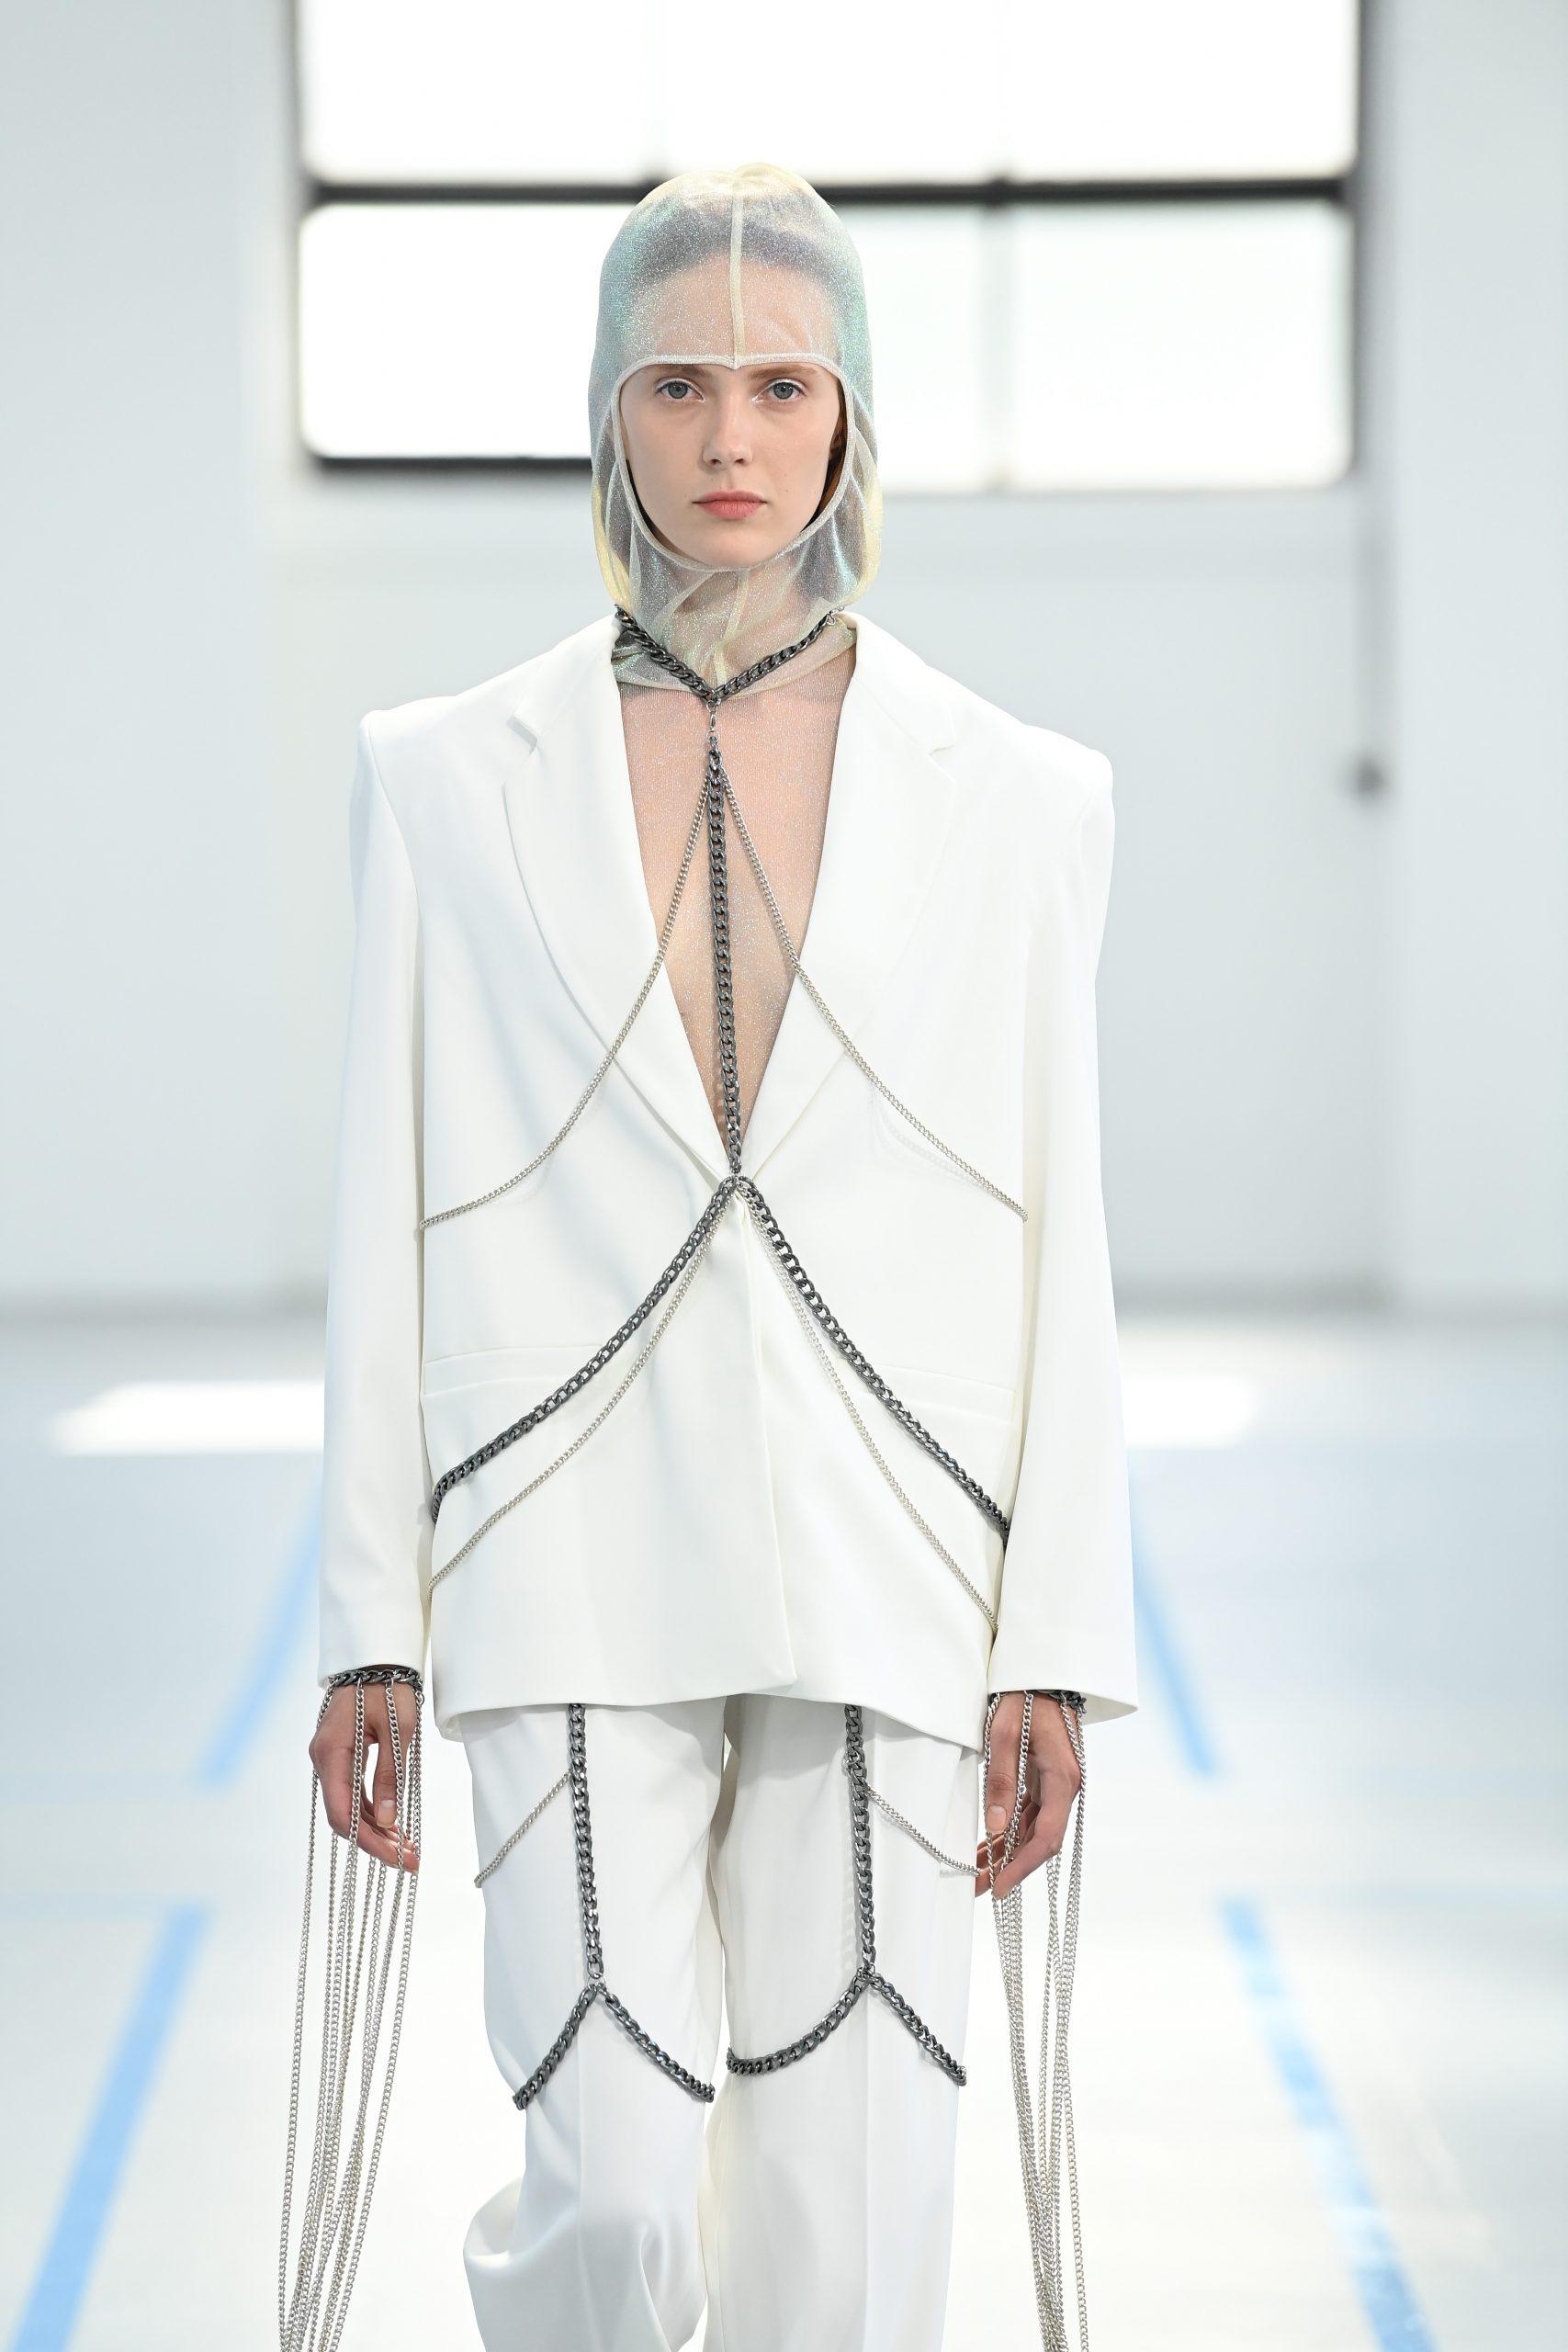 SECOLI Fashion Show 2021 (Photo by Daniele Venturelli )